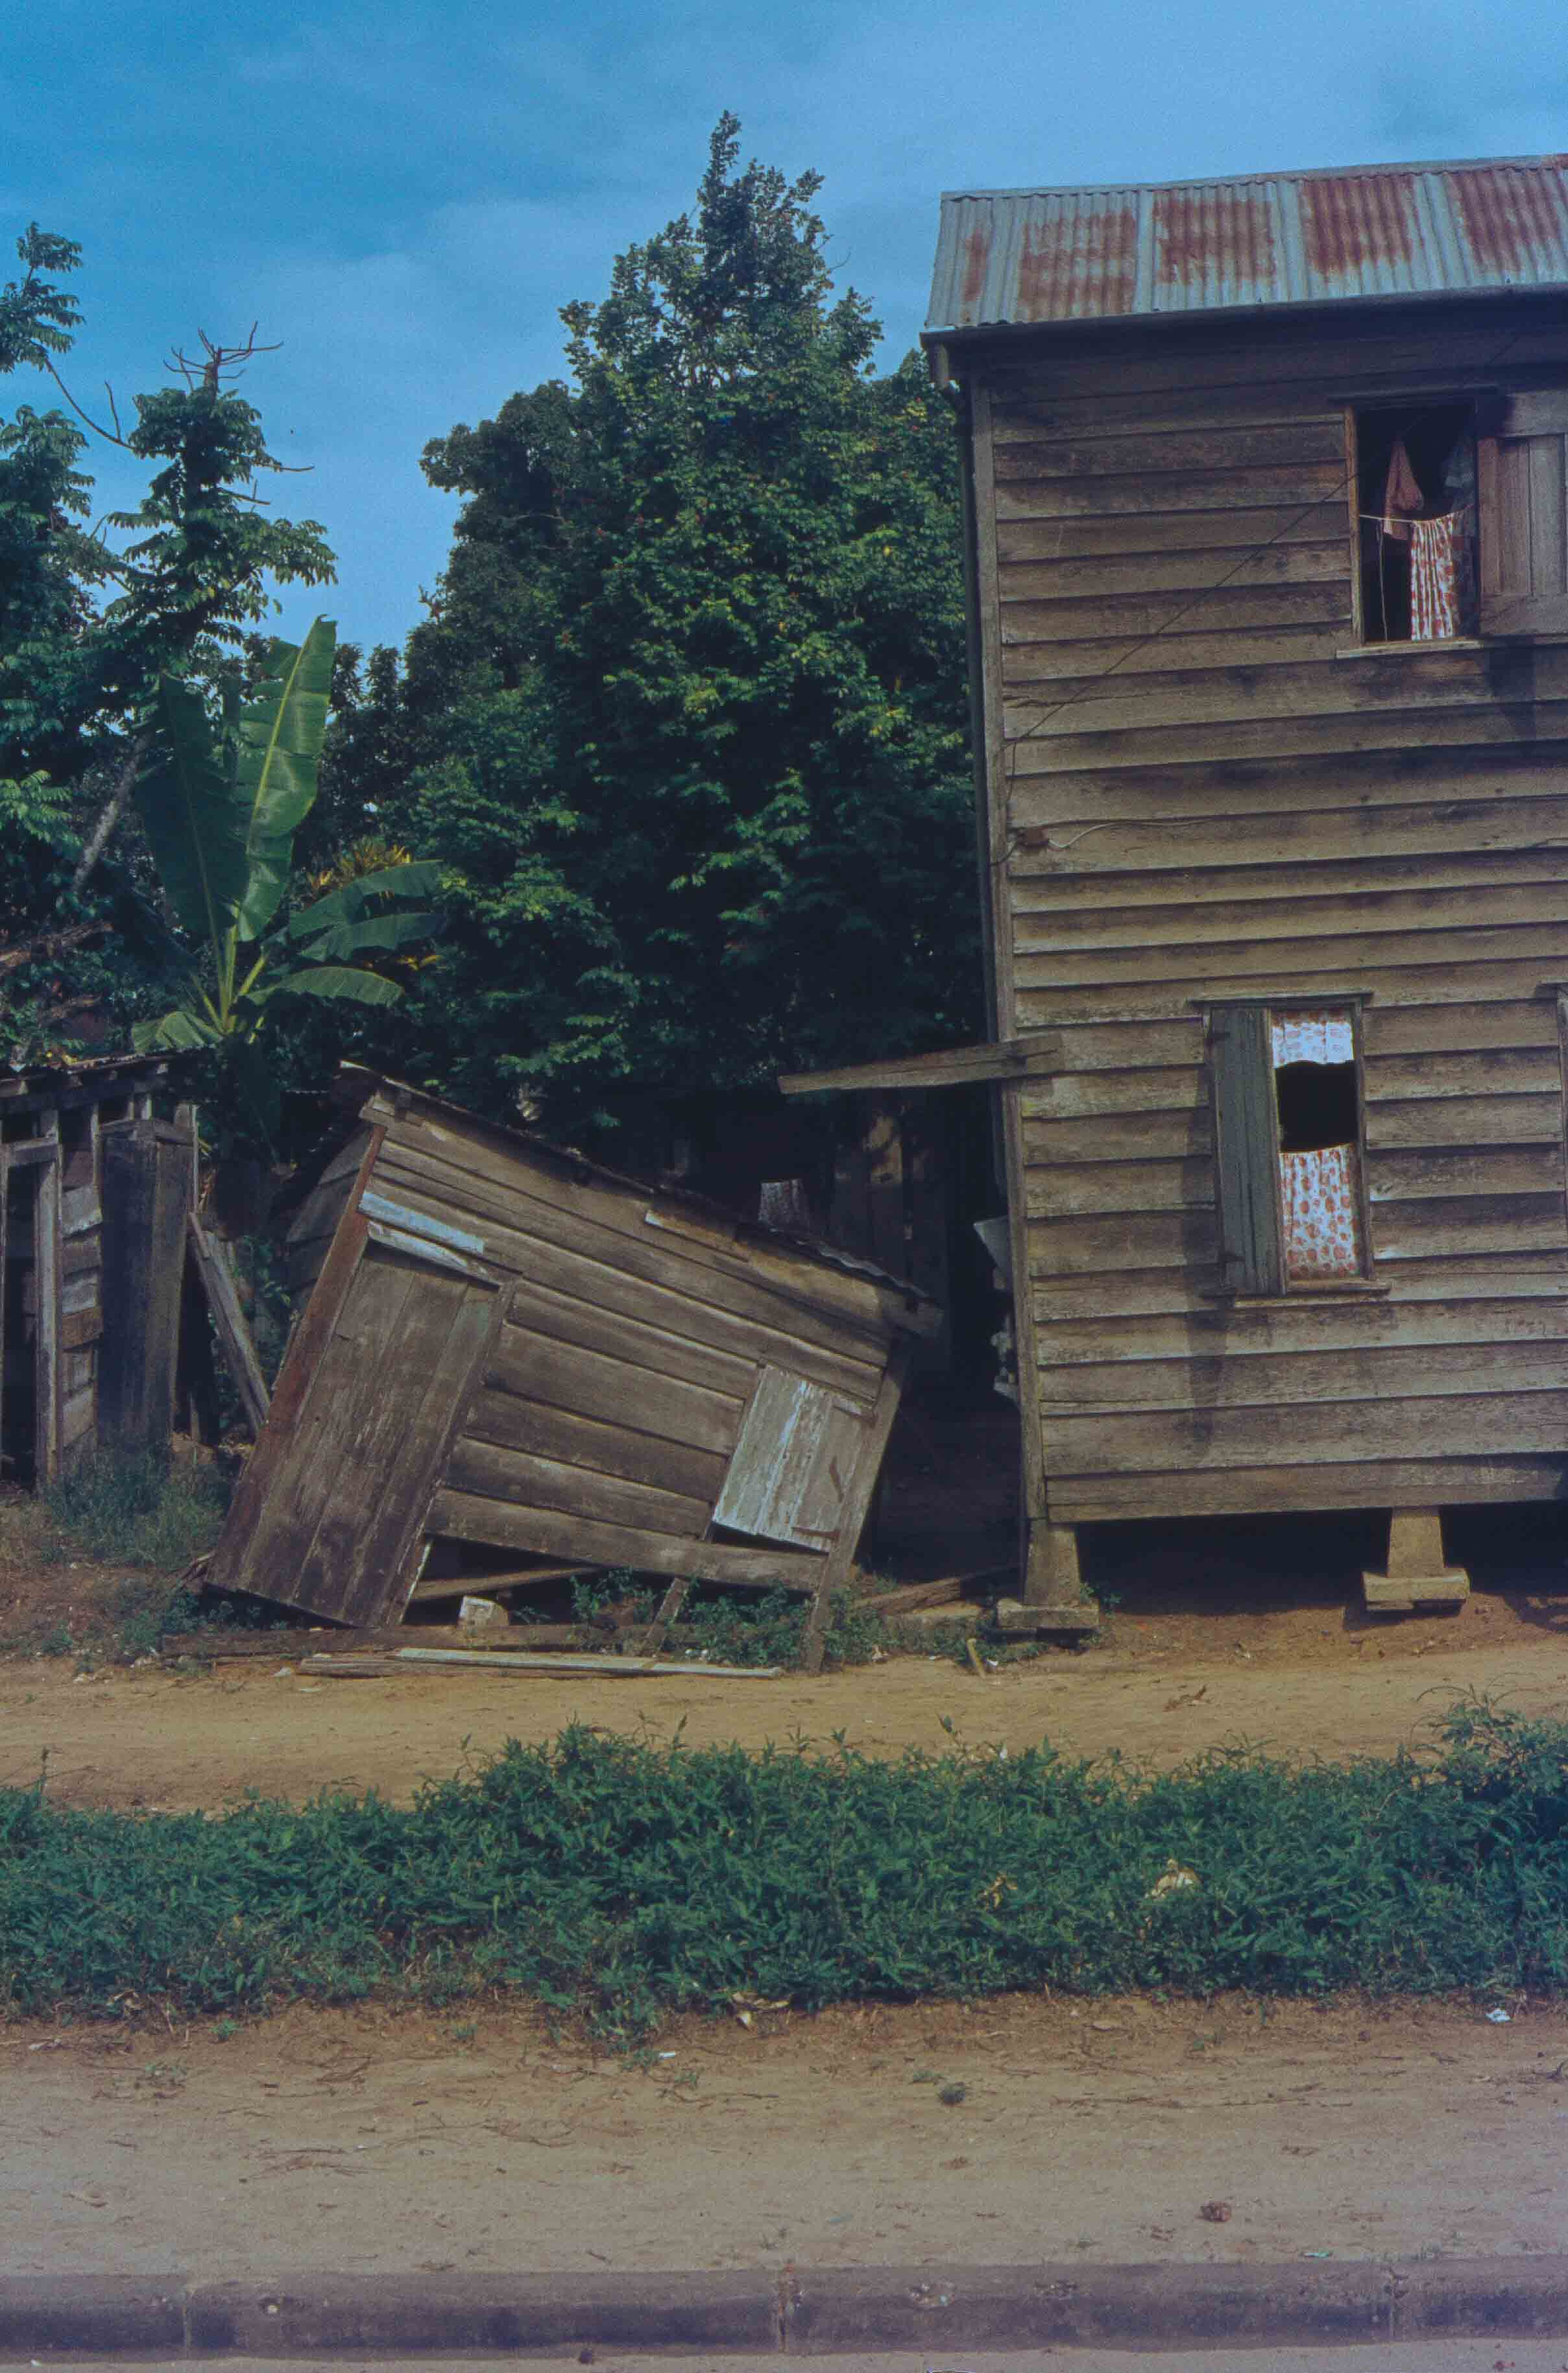 209. Suriname